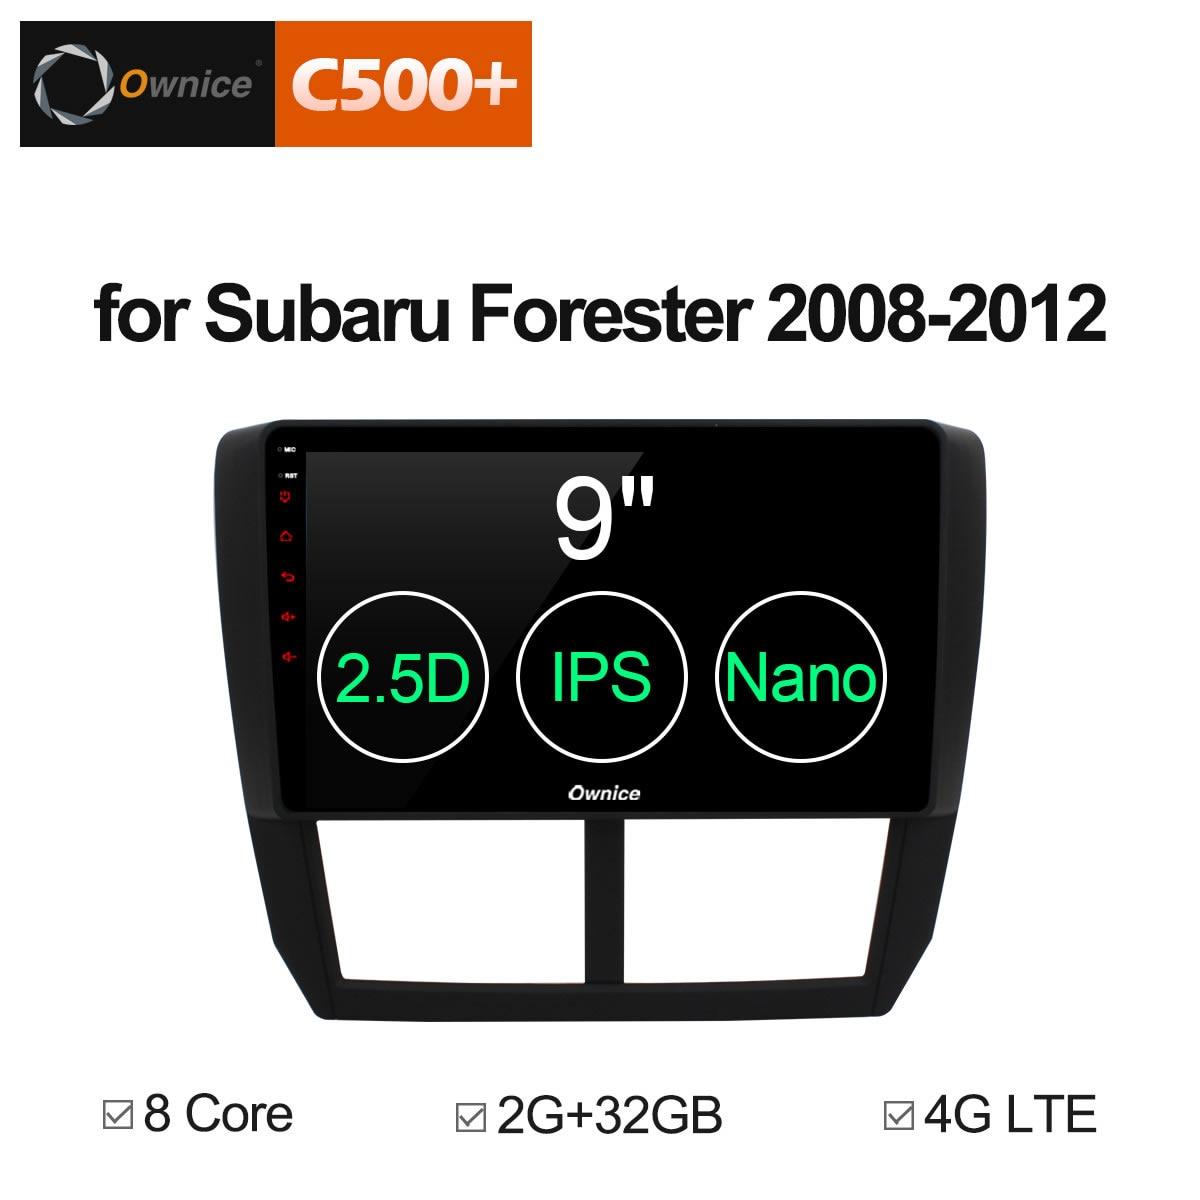 Ownice C500+ G10 Android 8.1 8 Core Car DVD player GPS navi radio Stereo For Subaru Forester 2008 - 2012 Autoradio headunit 32GOwnice C500+ G10 Android 8.1 8 Core Car DVD player GPS navi radio Stereo For Subaru Forester 2008 - 2012 Autoradio headunit 32G